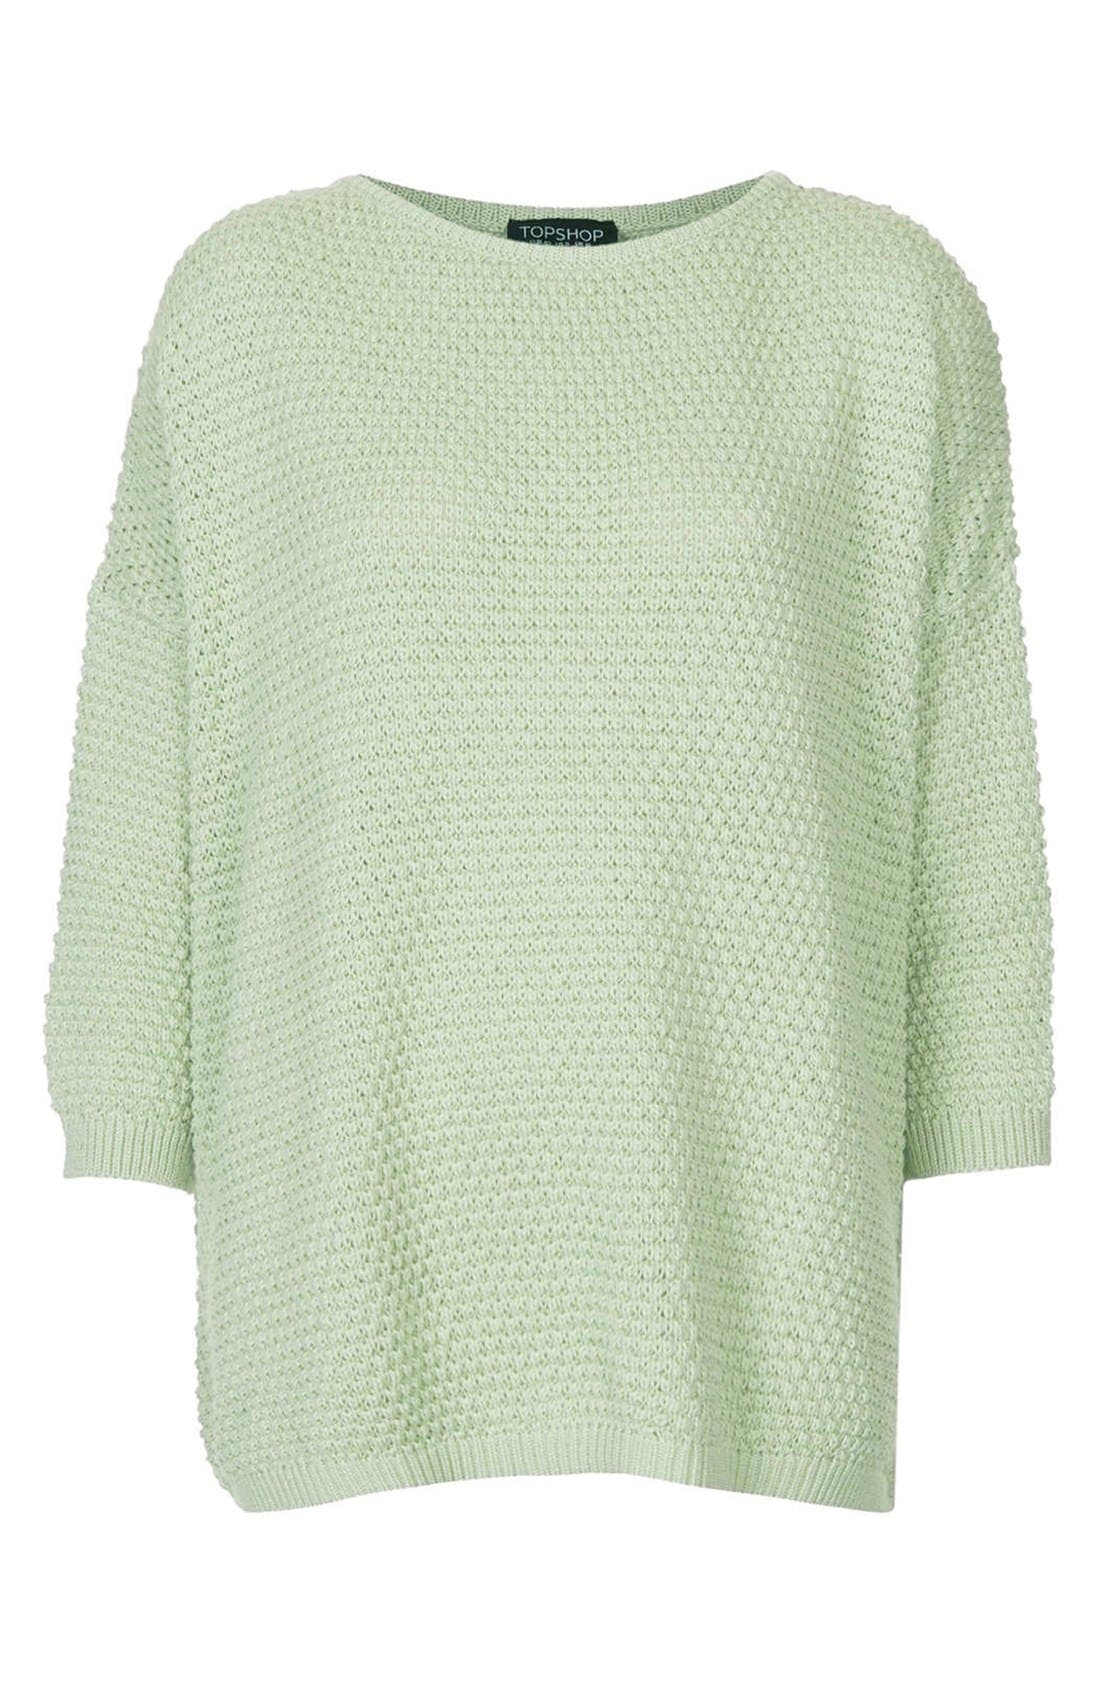 Alternate Image 3  - Topshop Tulip Stitch Sweater